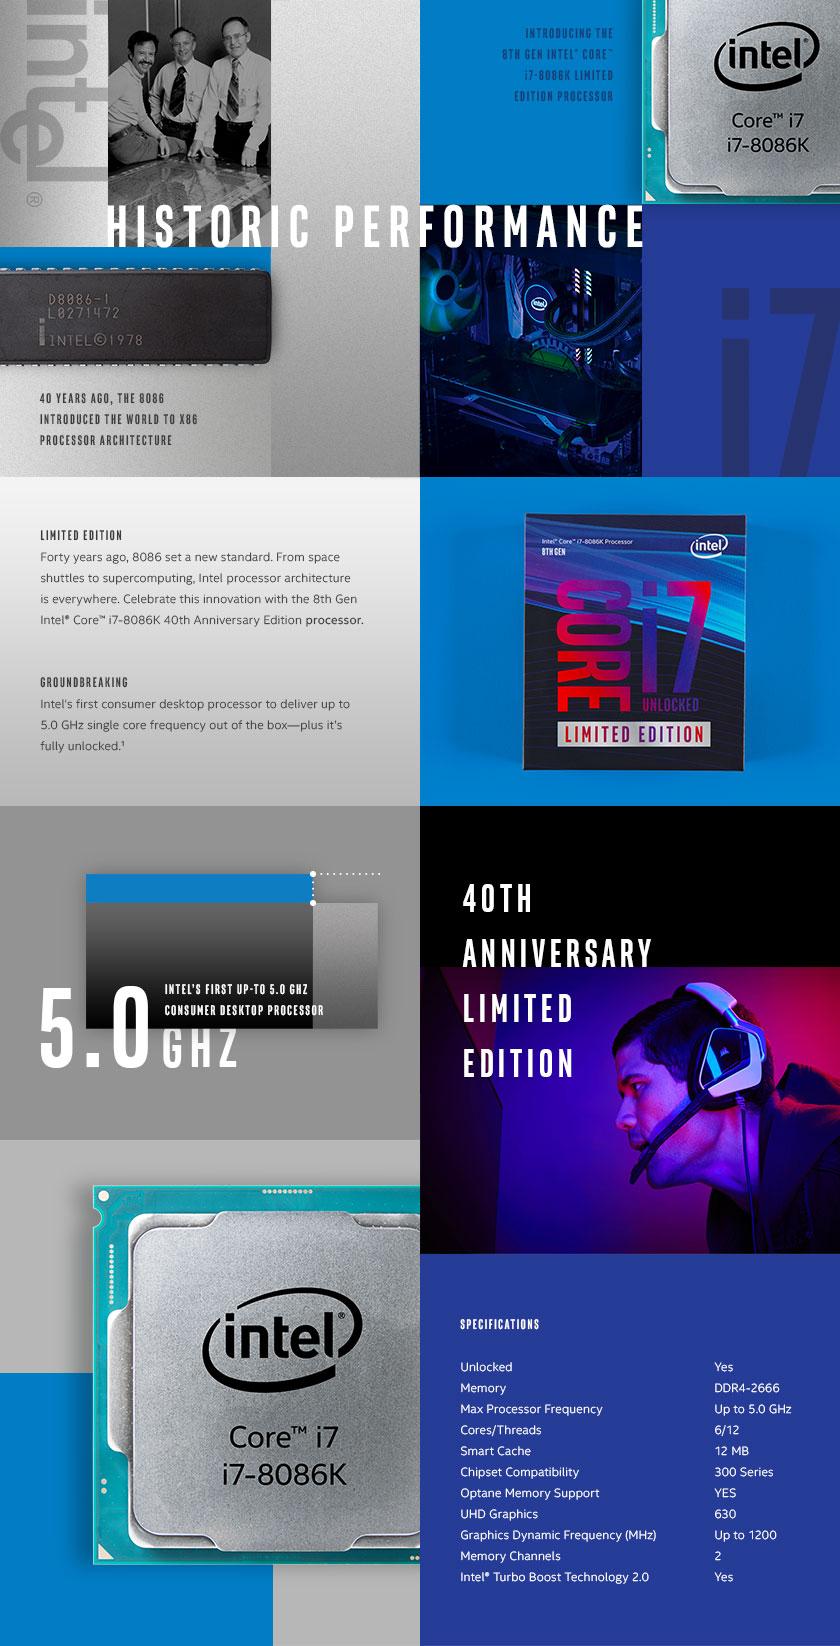 Intel Limited Edition 8086K